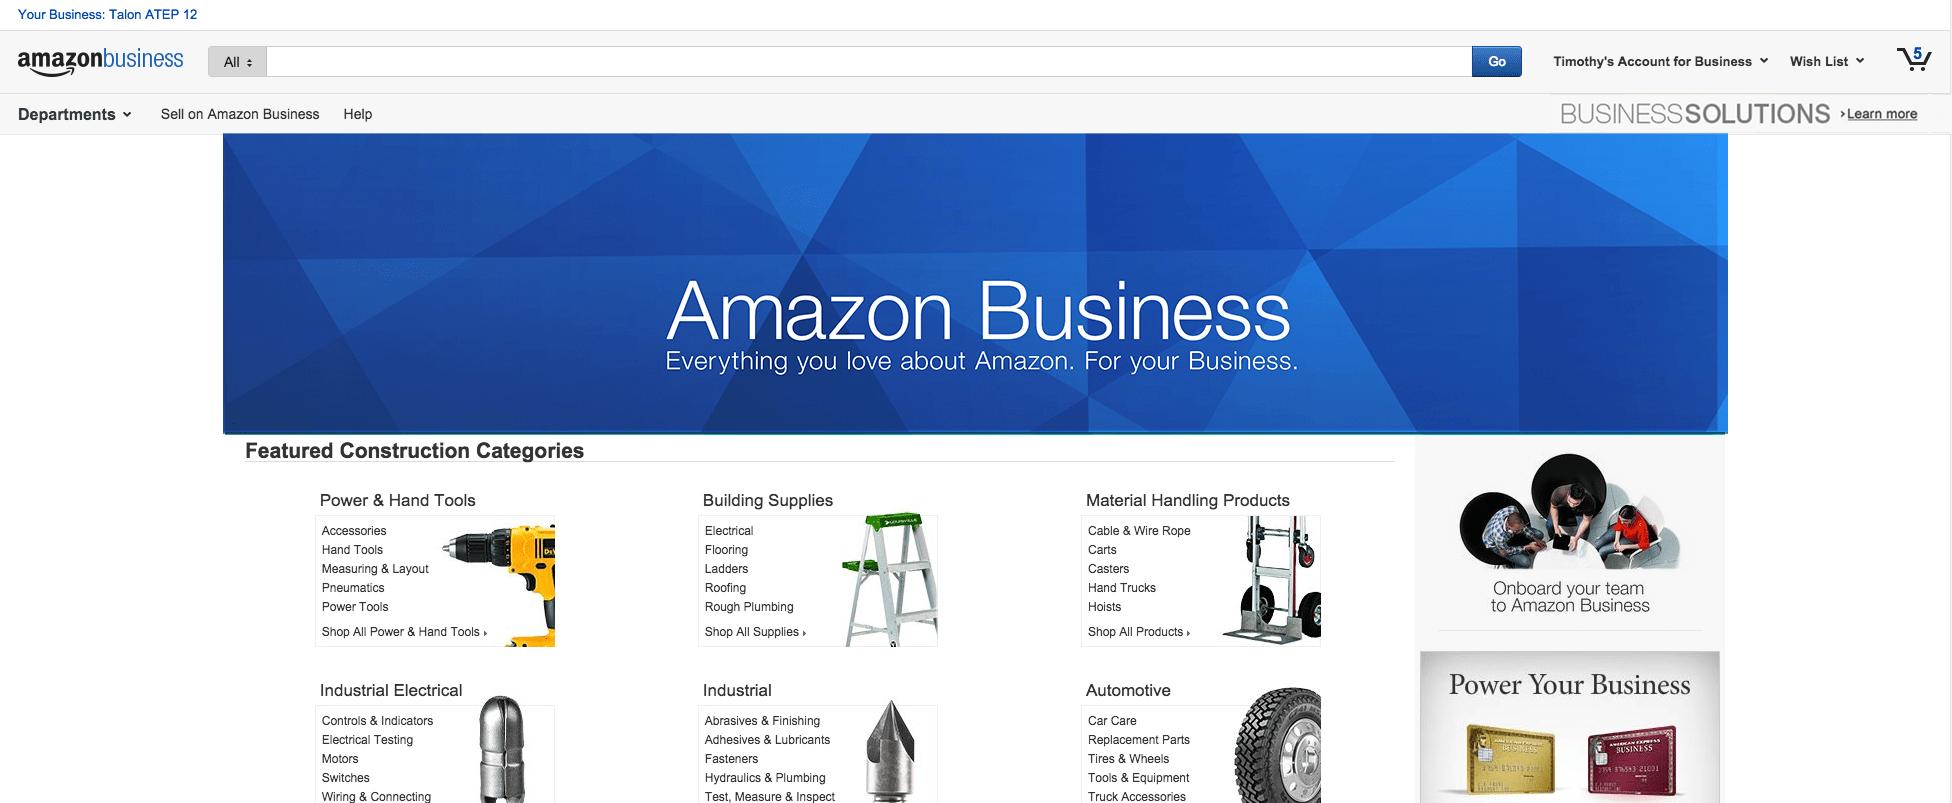 Amazon launches Amazon Business, sunsets AmazonSupply | VentureBeat